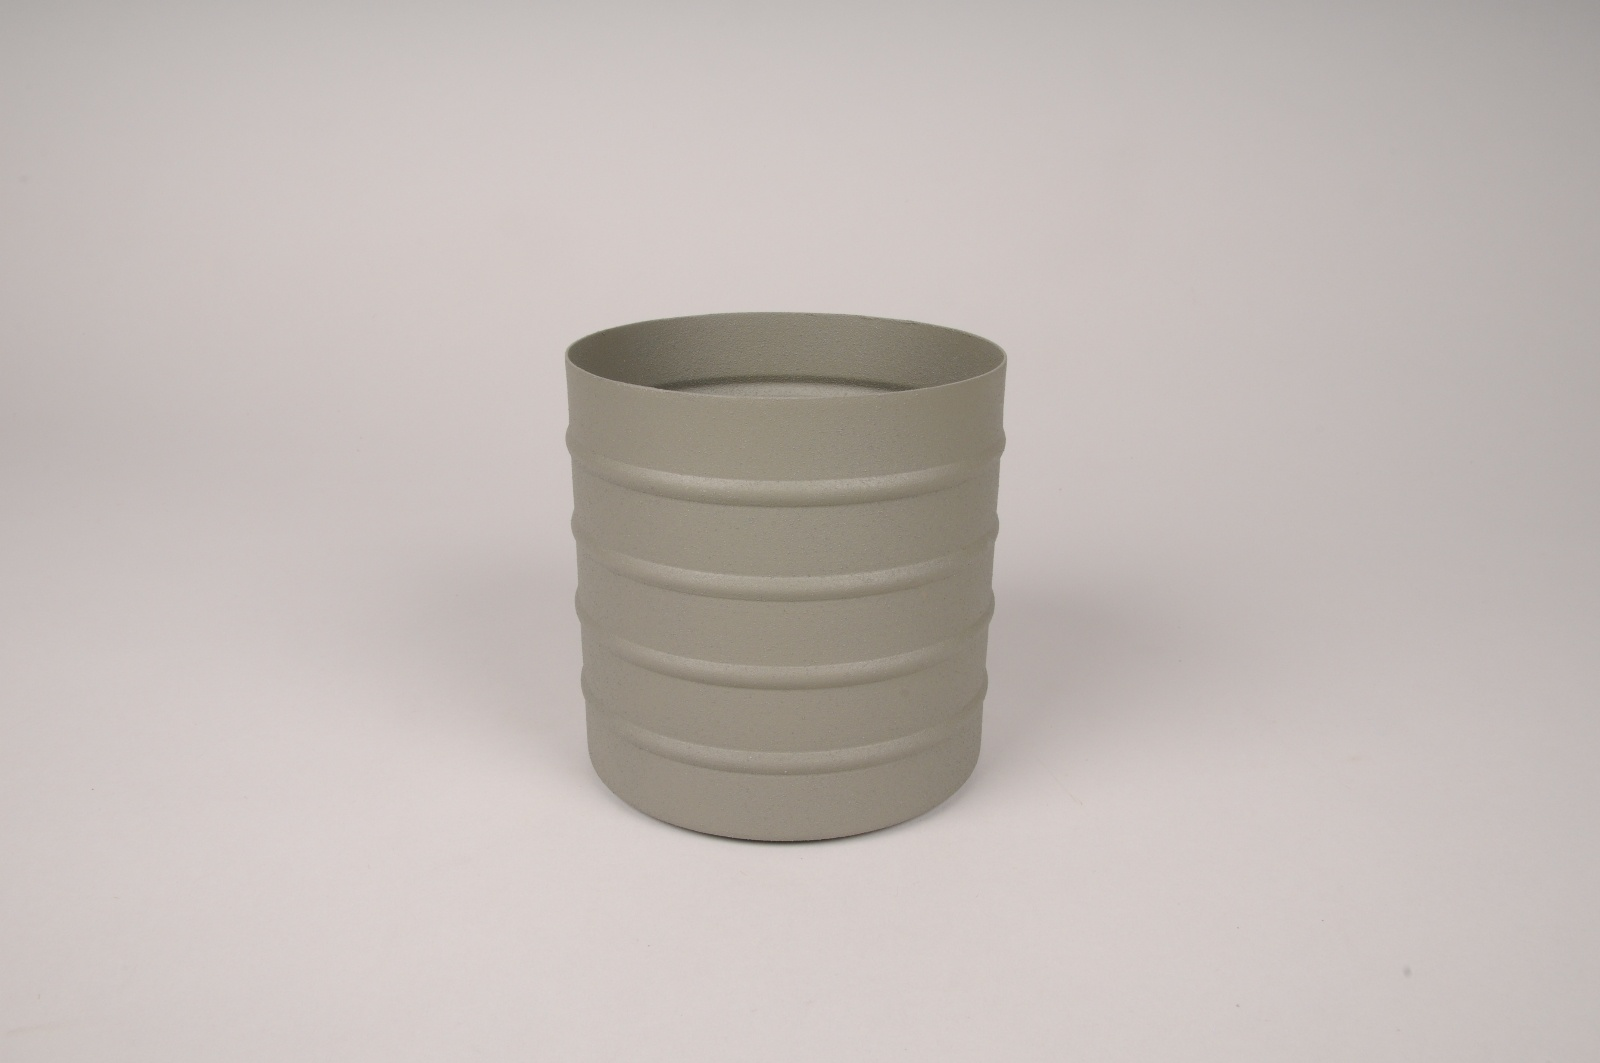 A007U9 Cache-pot en métal vert kaki D12cm H12cm